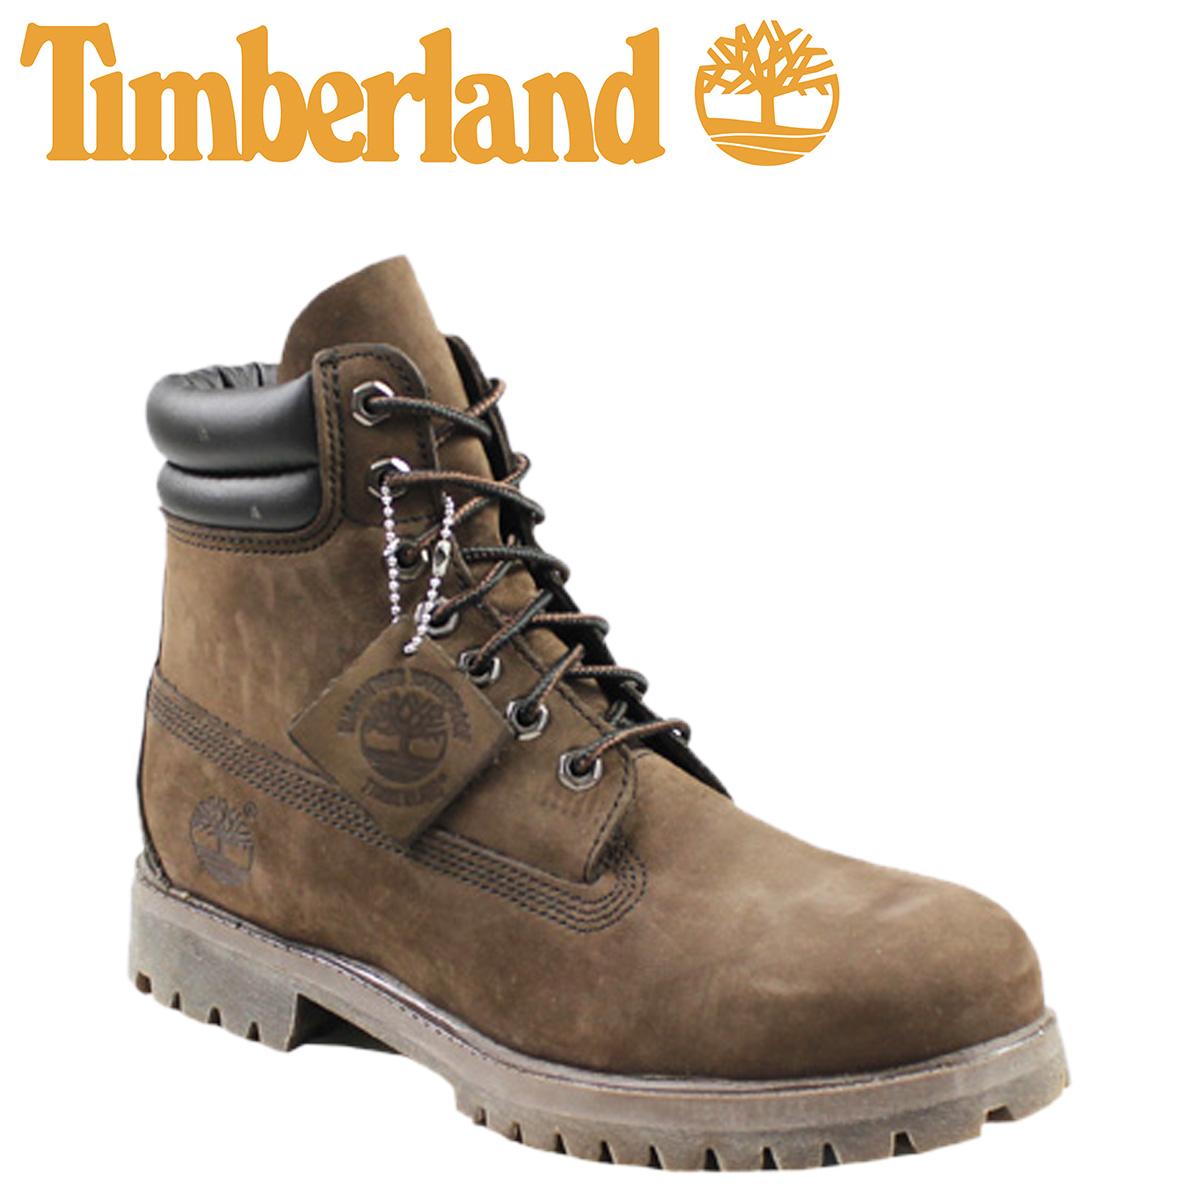 Boots Boots Timberland Timberland Timberland Timberland